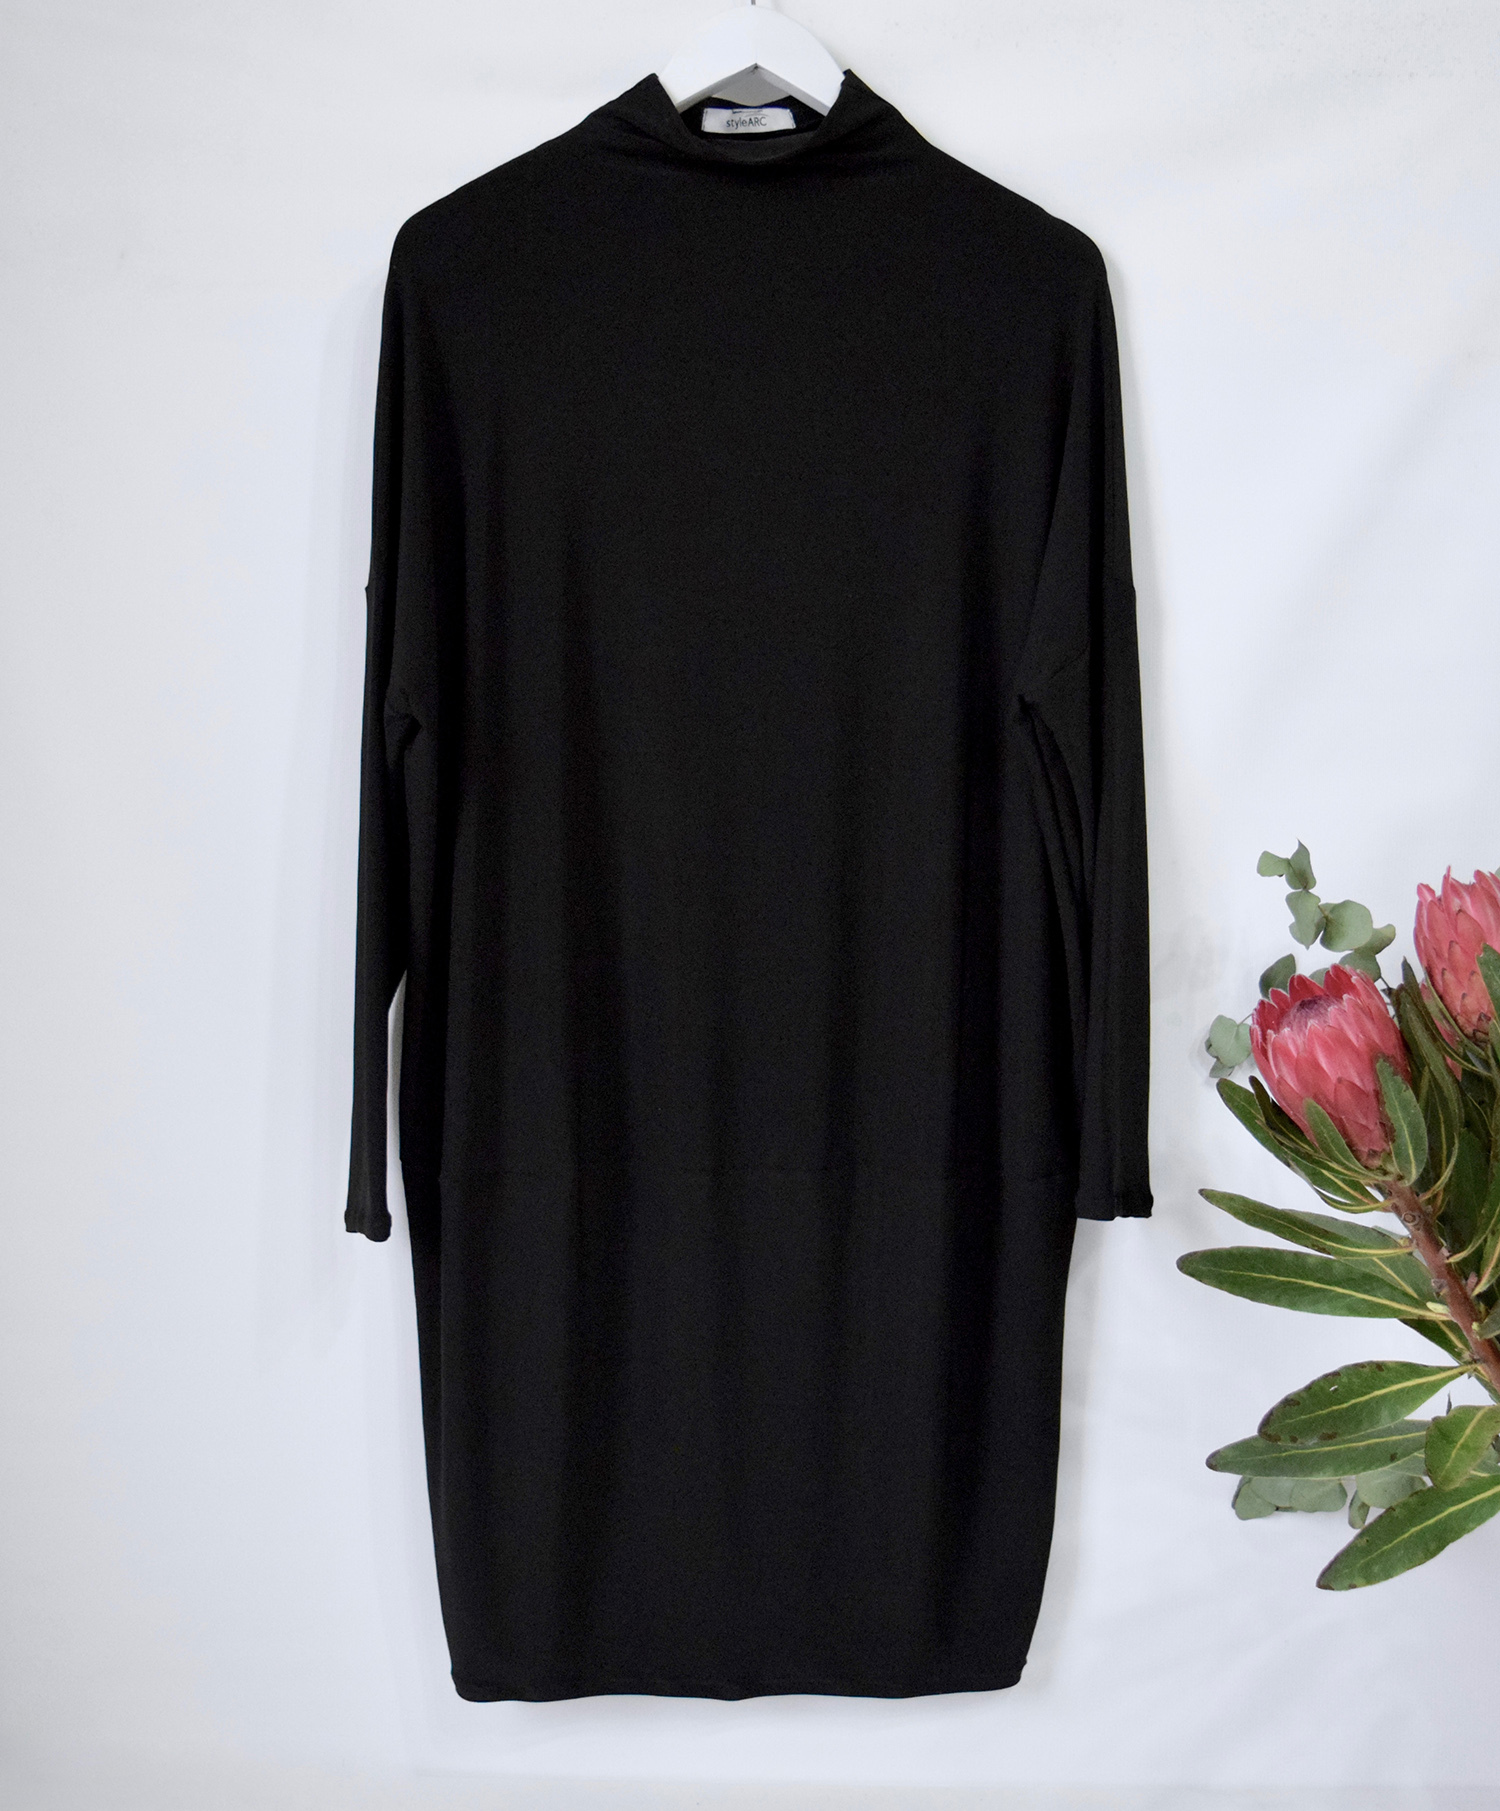 Cher Knit Dress by Style Arc